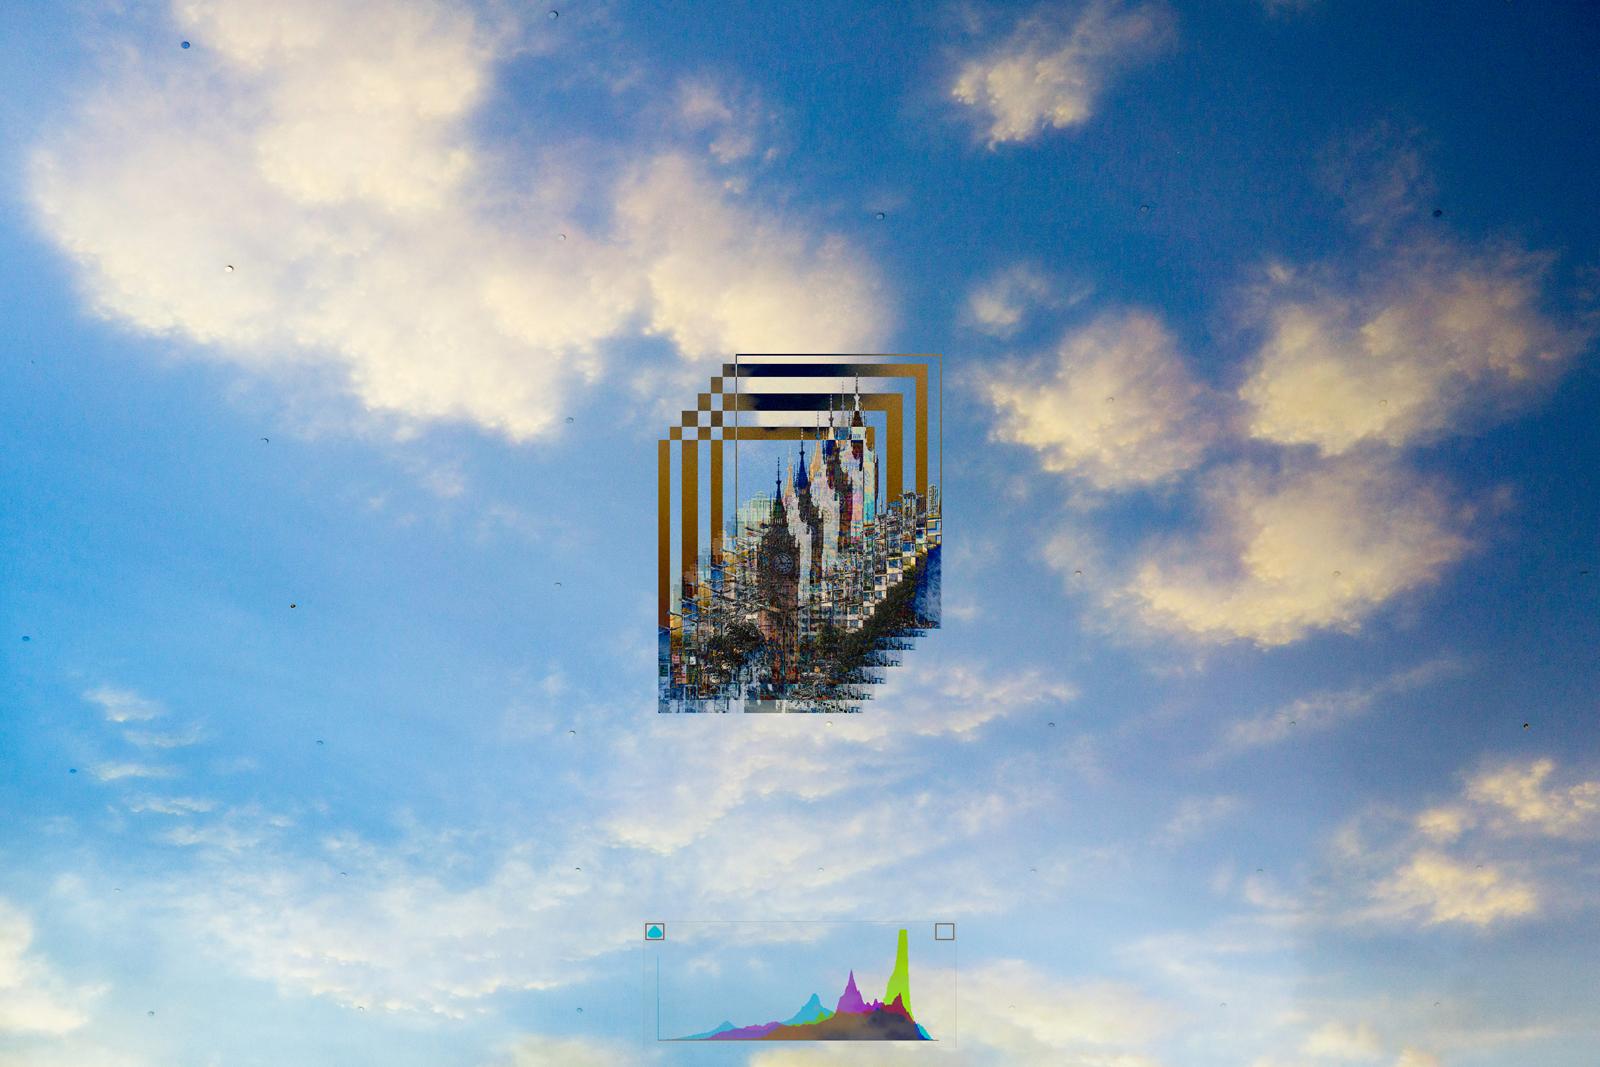 Expanding the probability distribution of the Big Ben, Kolkata into The Venetian Sky, Las Vegas